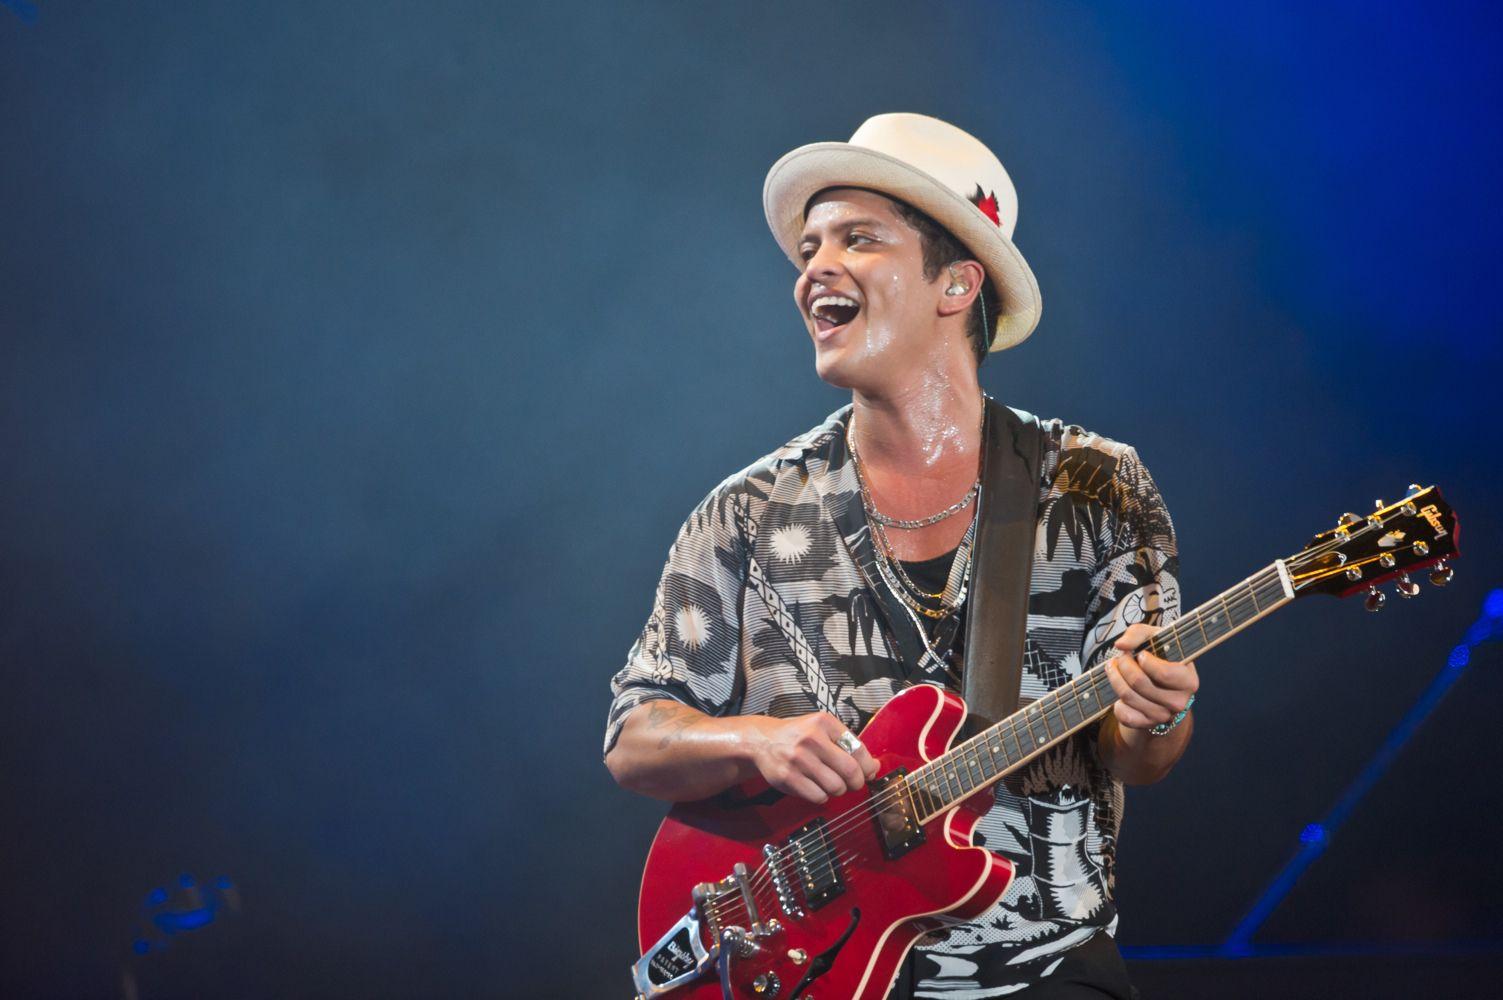 Bruno Mars Biography And Profile